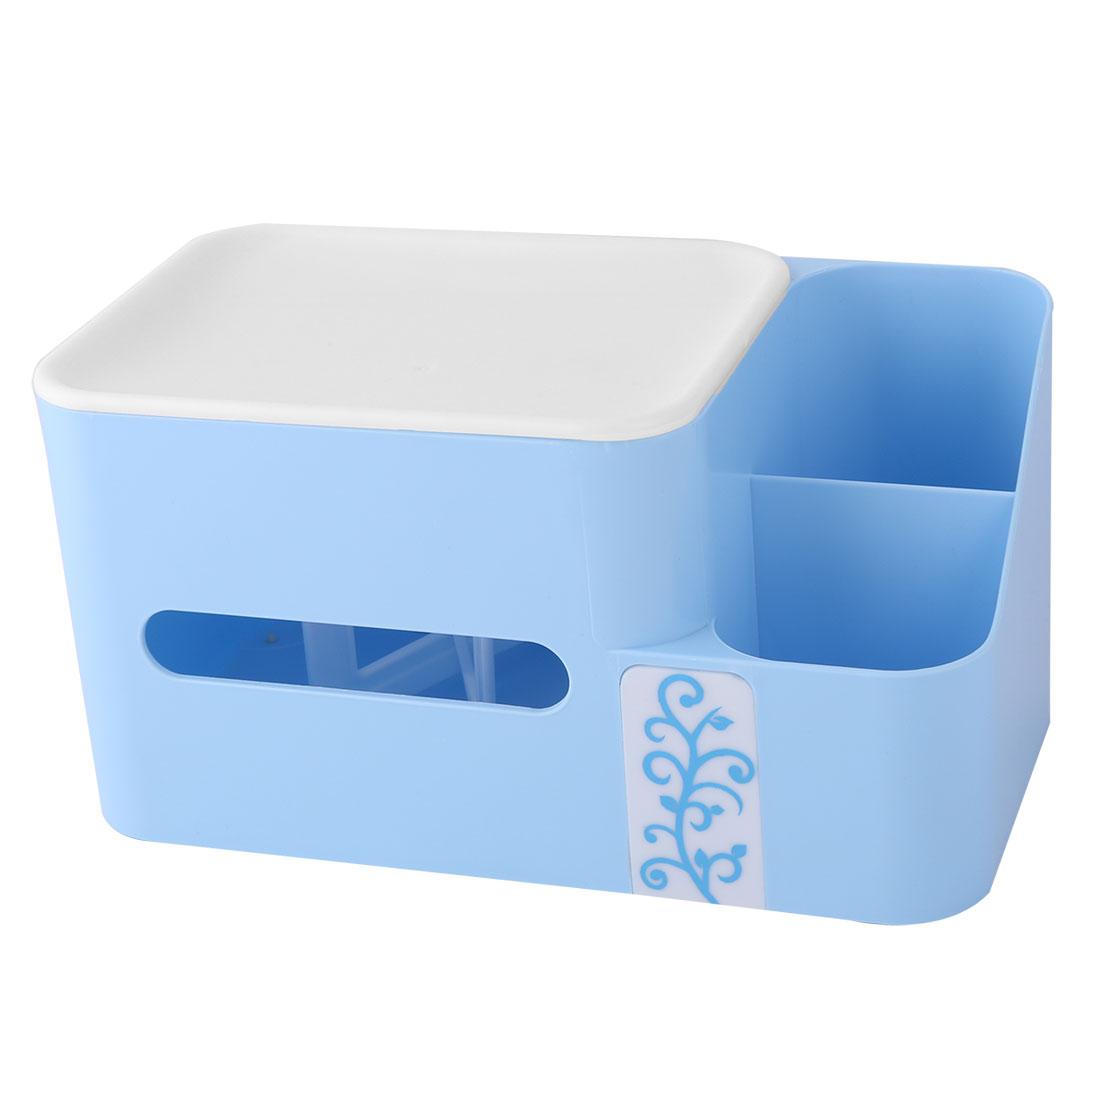 Bathroom Kitchen Plastic Tissue Paper Napkin Container Storage Box Holder Blue